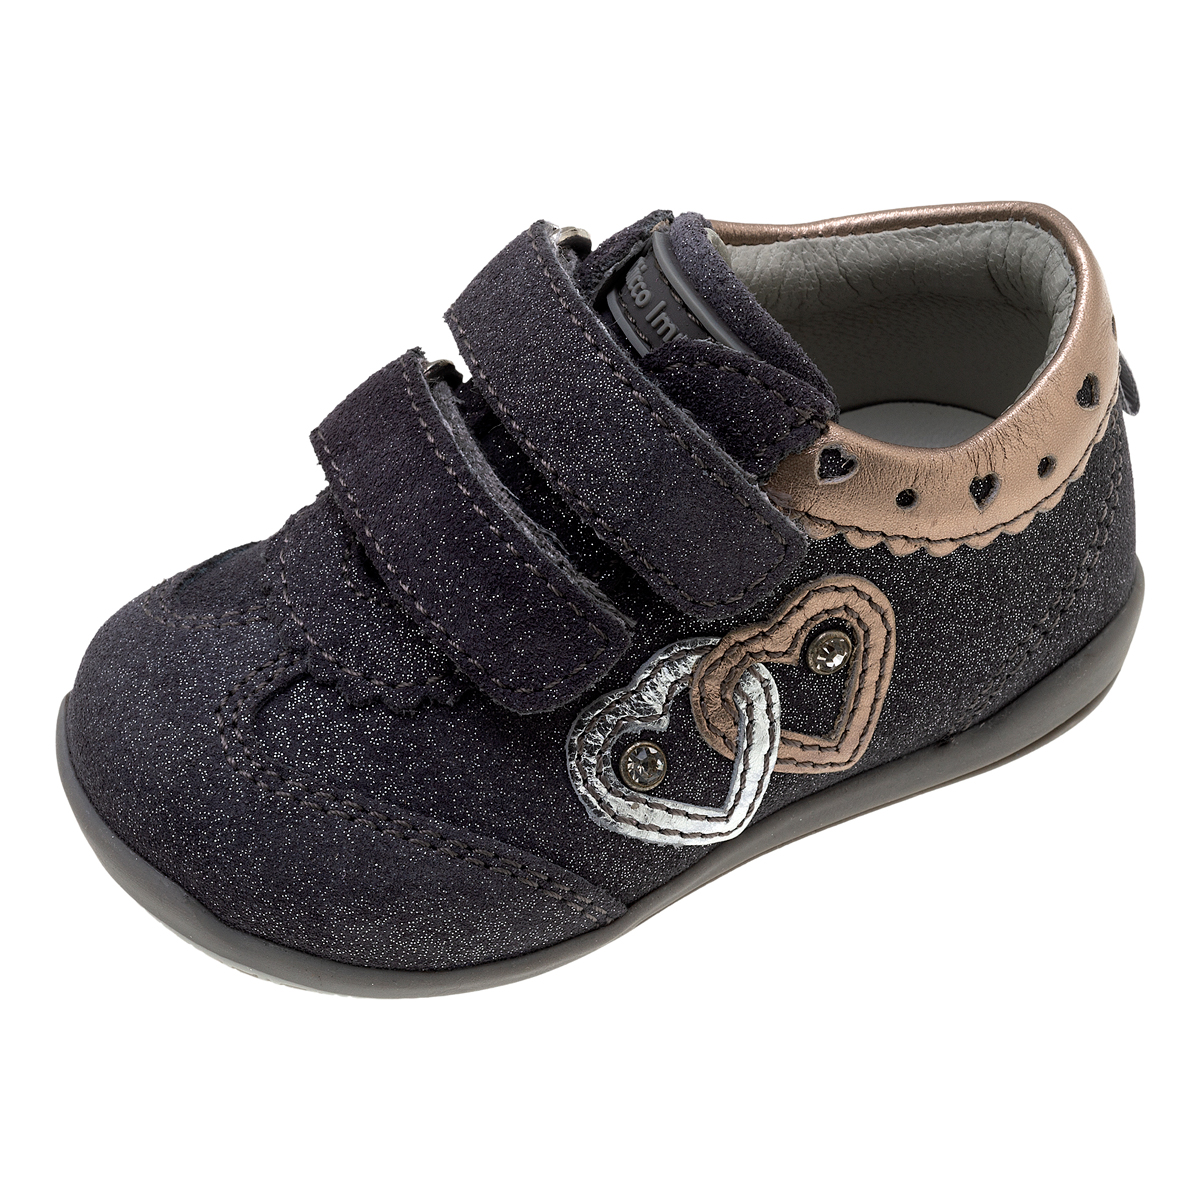 Pantofi copii Chicco Gualda, argintiu, 62533 din categoria Ghete copii si bebelusi